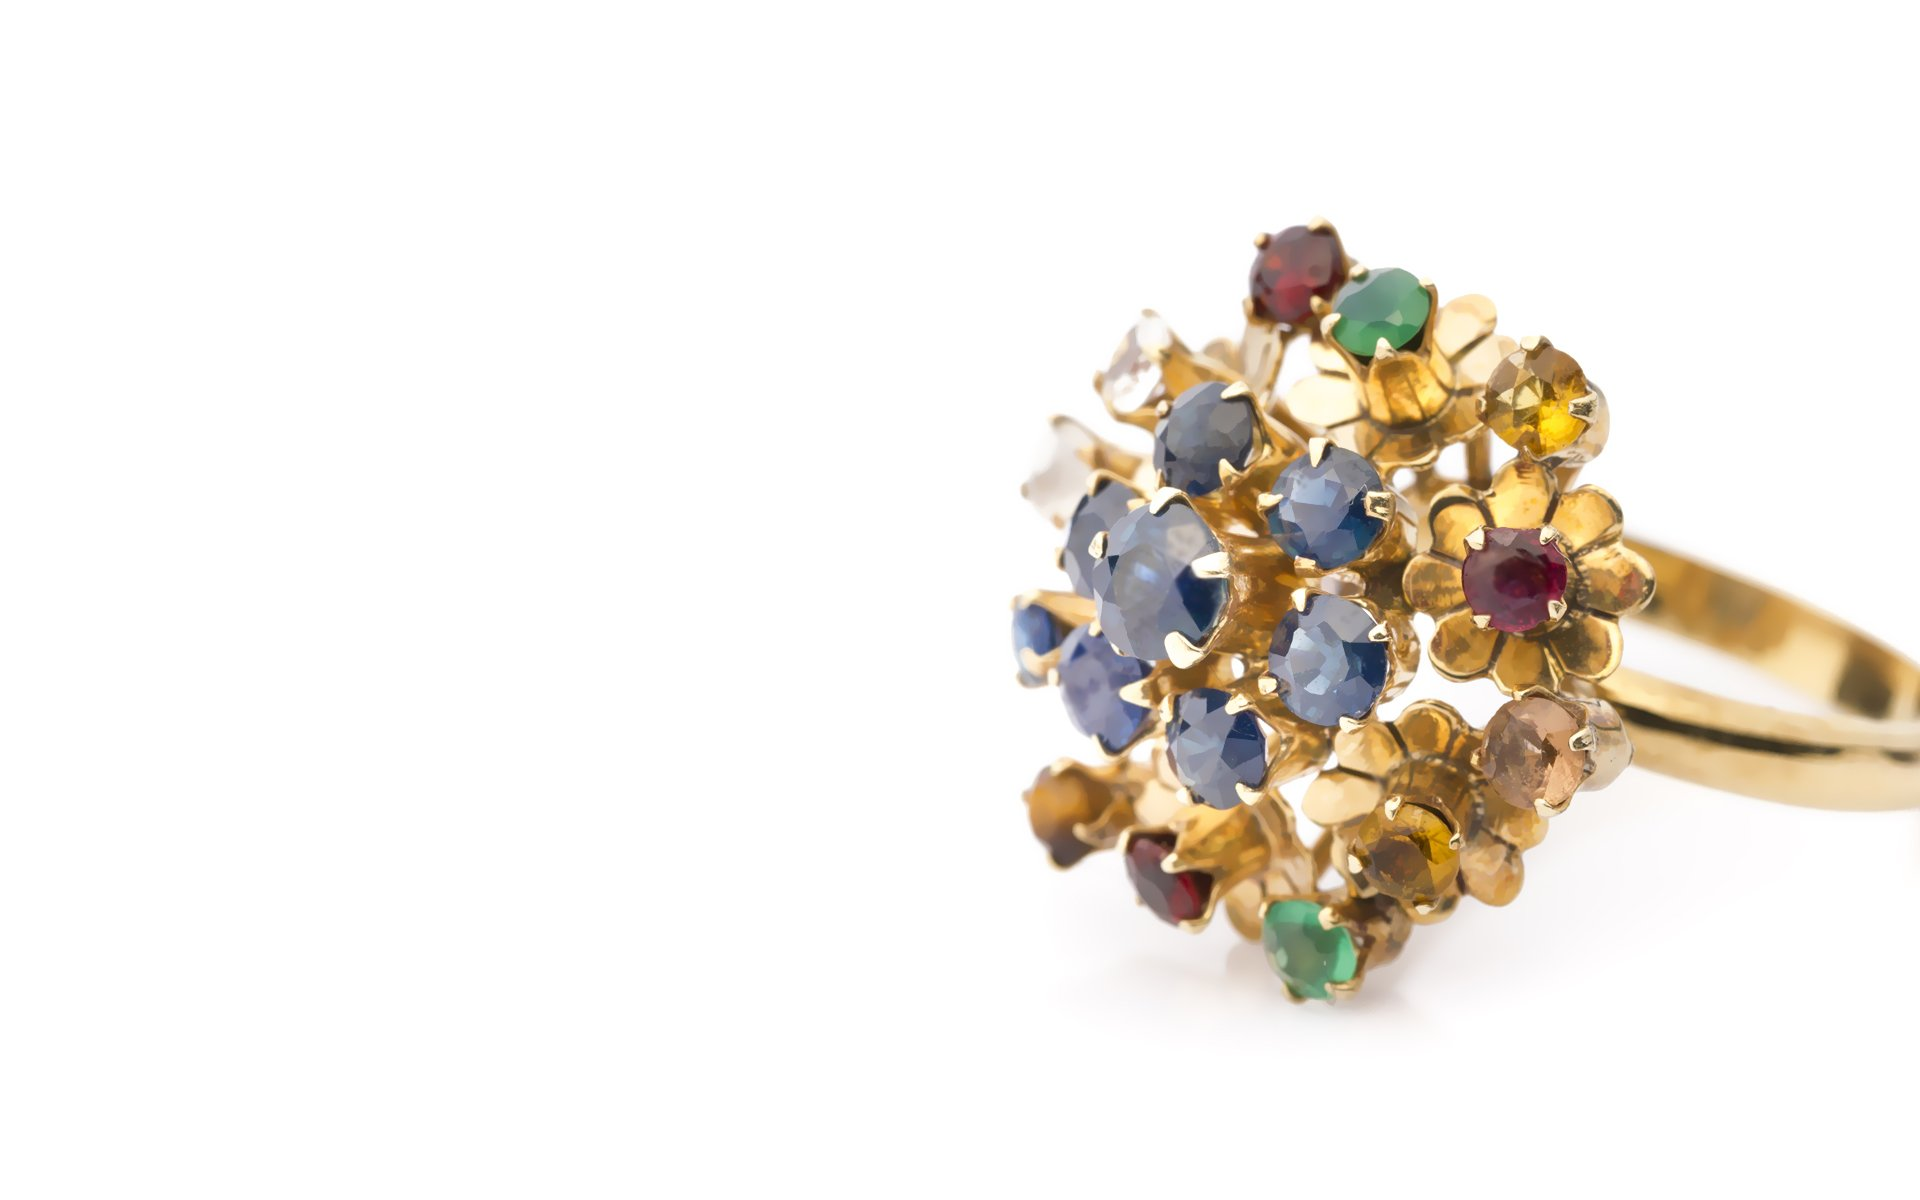 10+ Jewelry store fuquay varina nc ideas in 2021